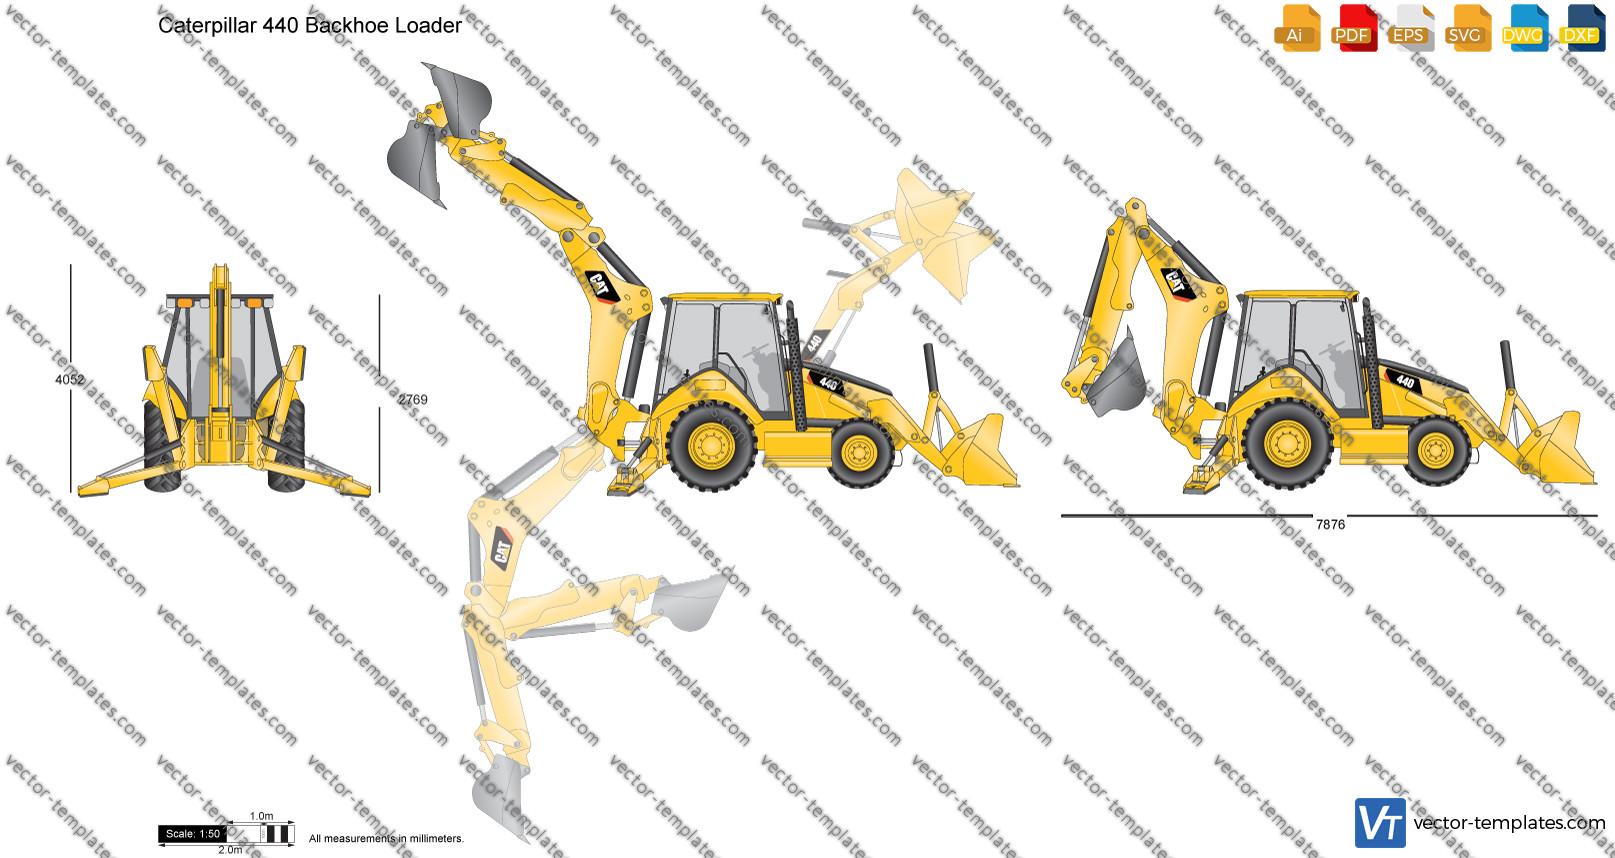 Caterpillar 440 Backhoe Loader